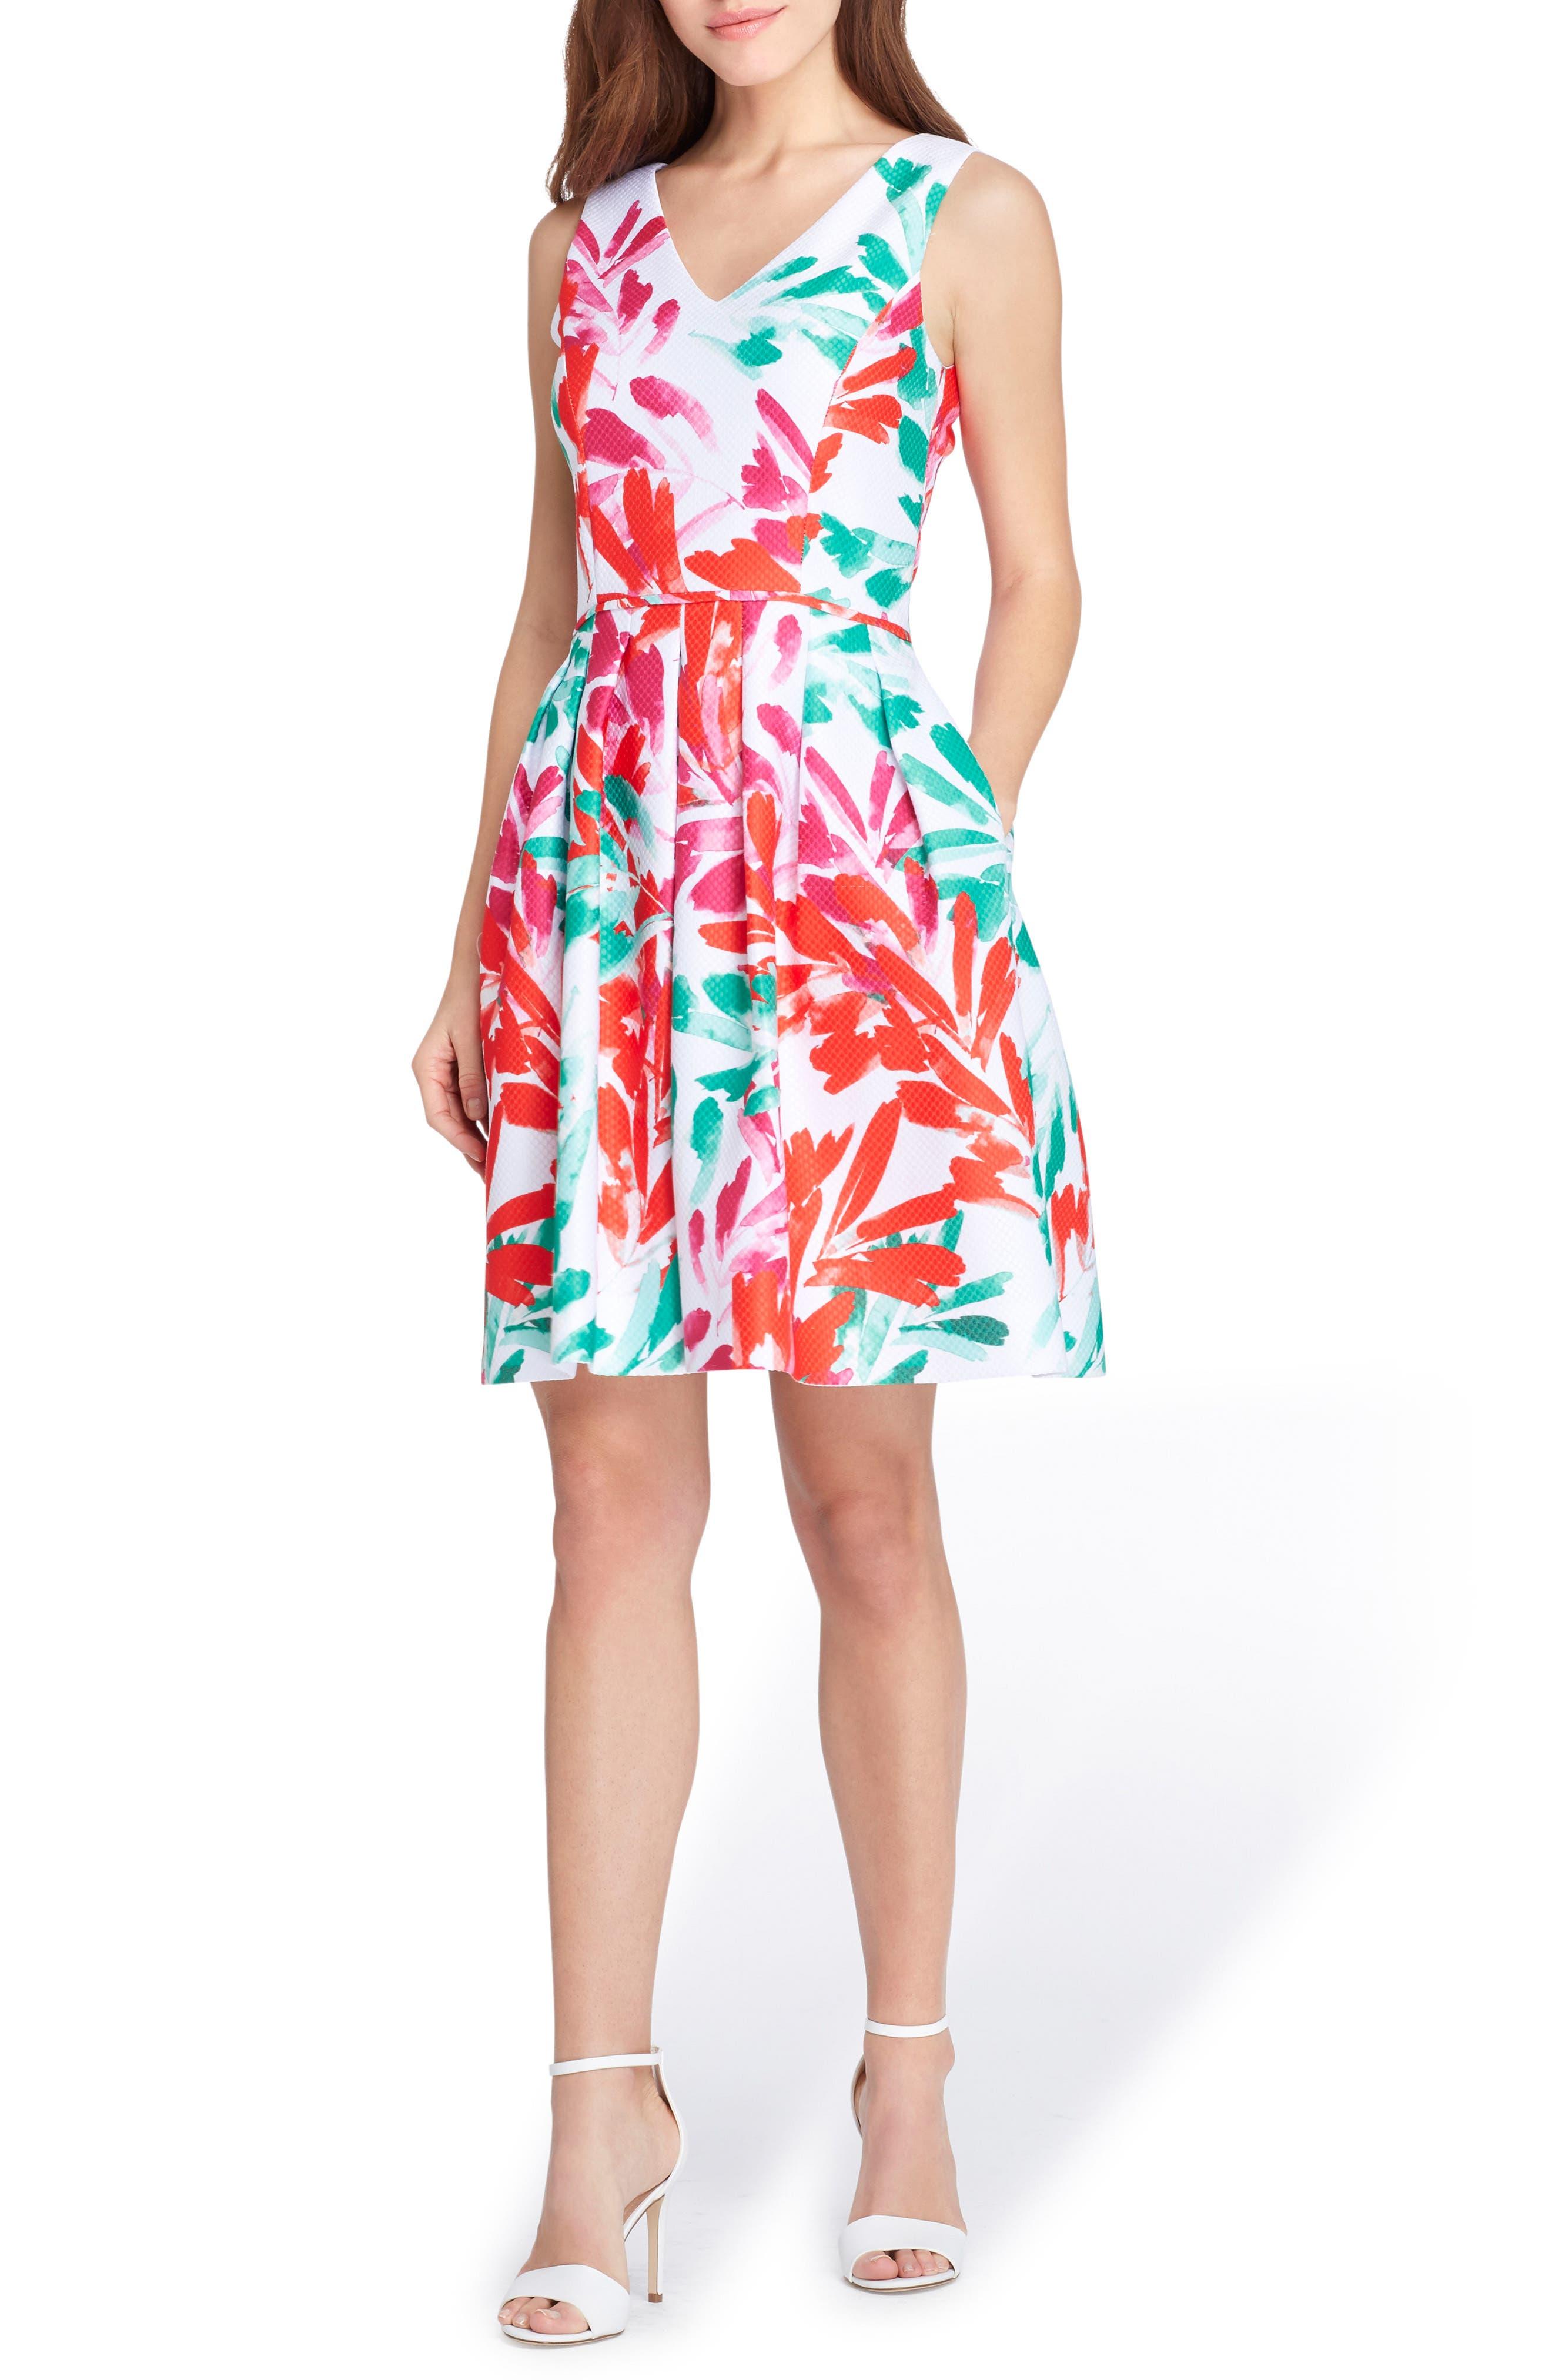 Print Jacquard Dress,                         Main,                         color, White/ Coral/ Sea Glass